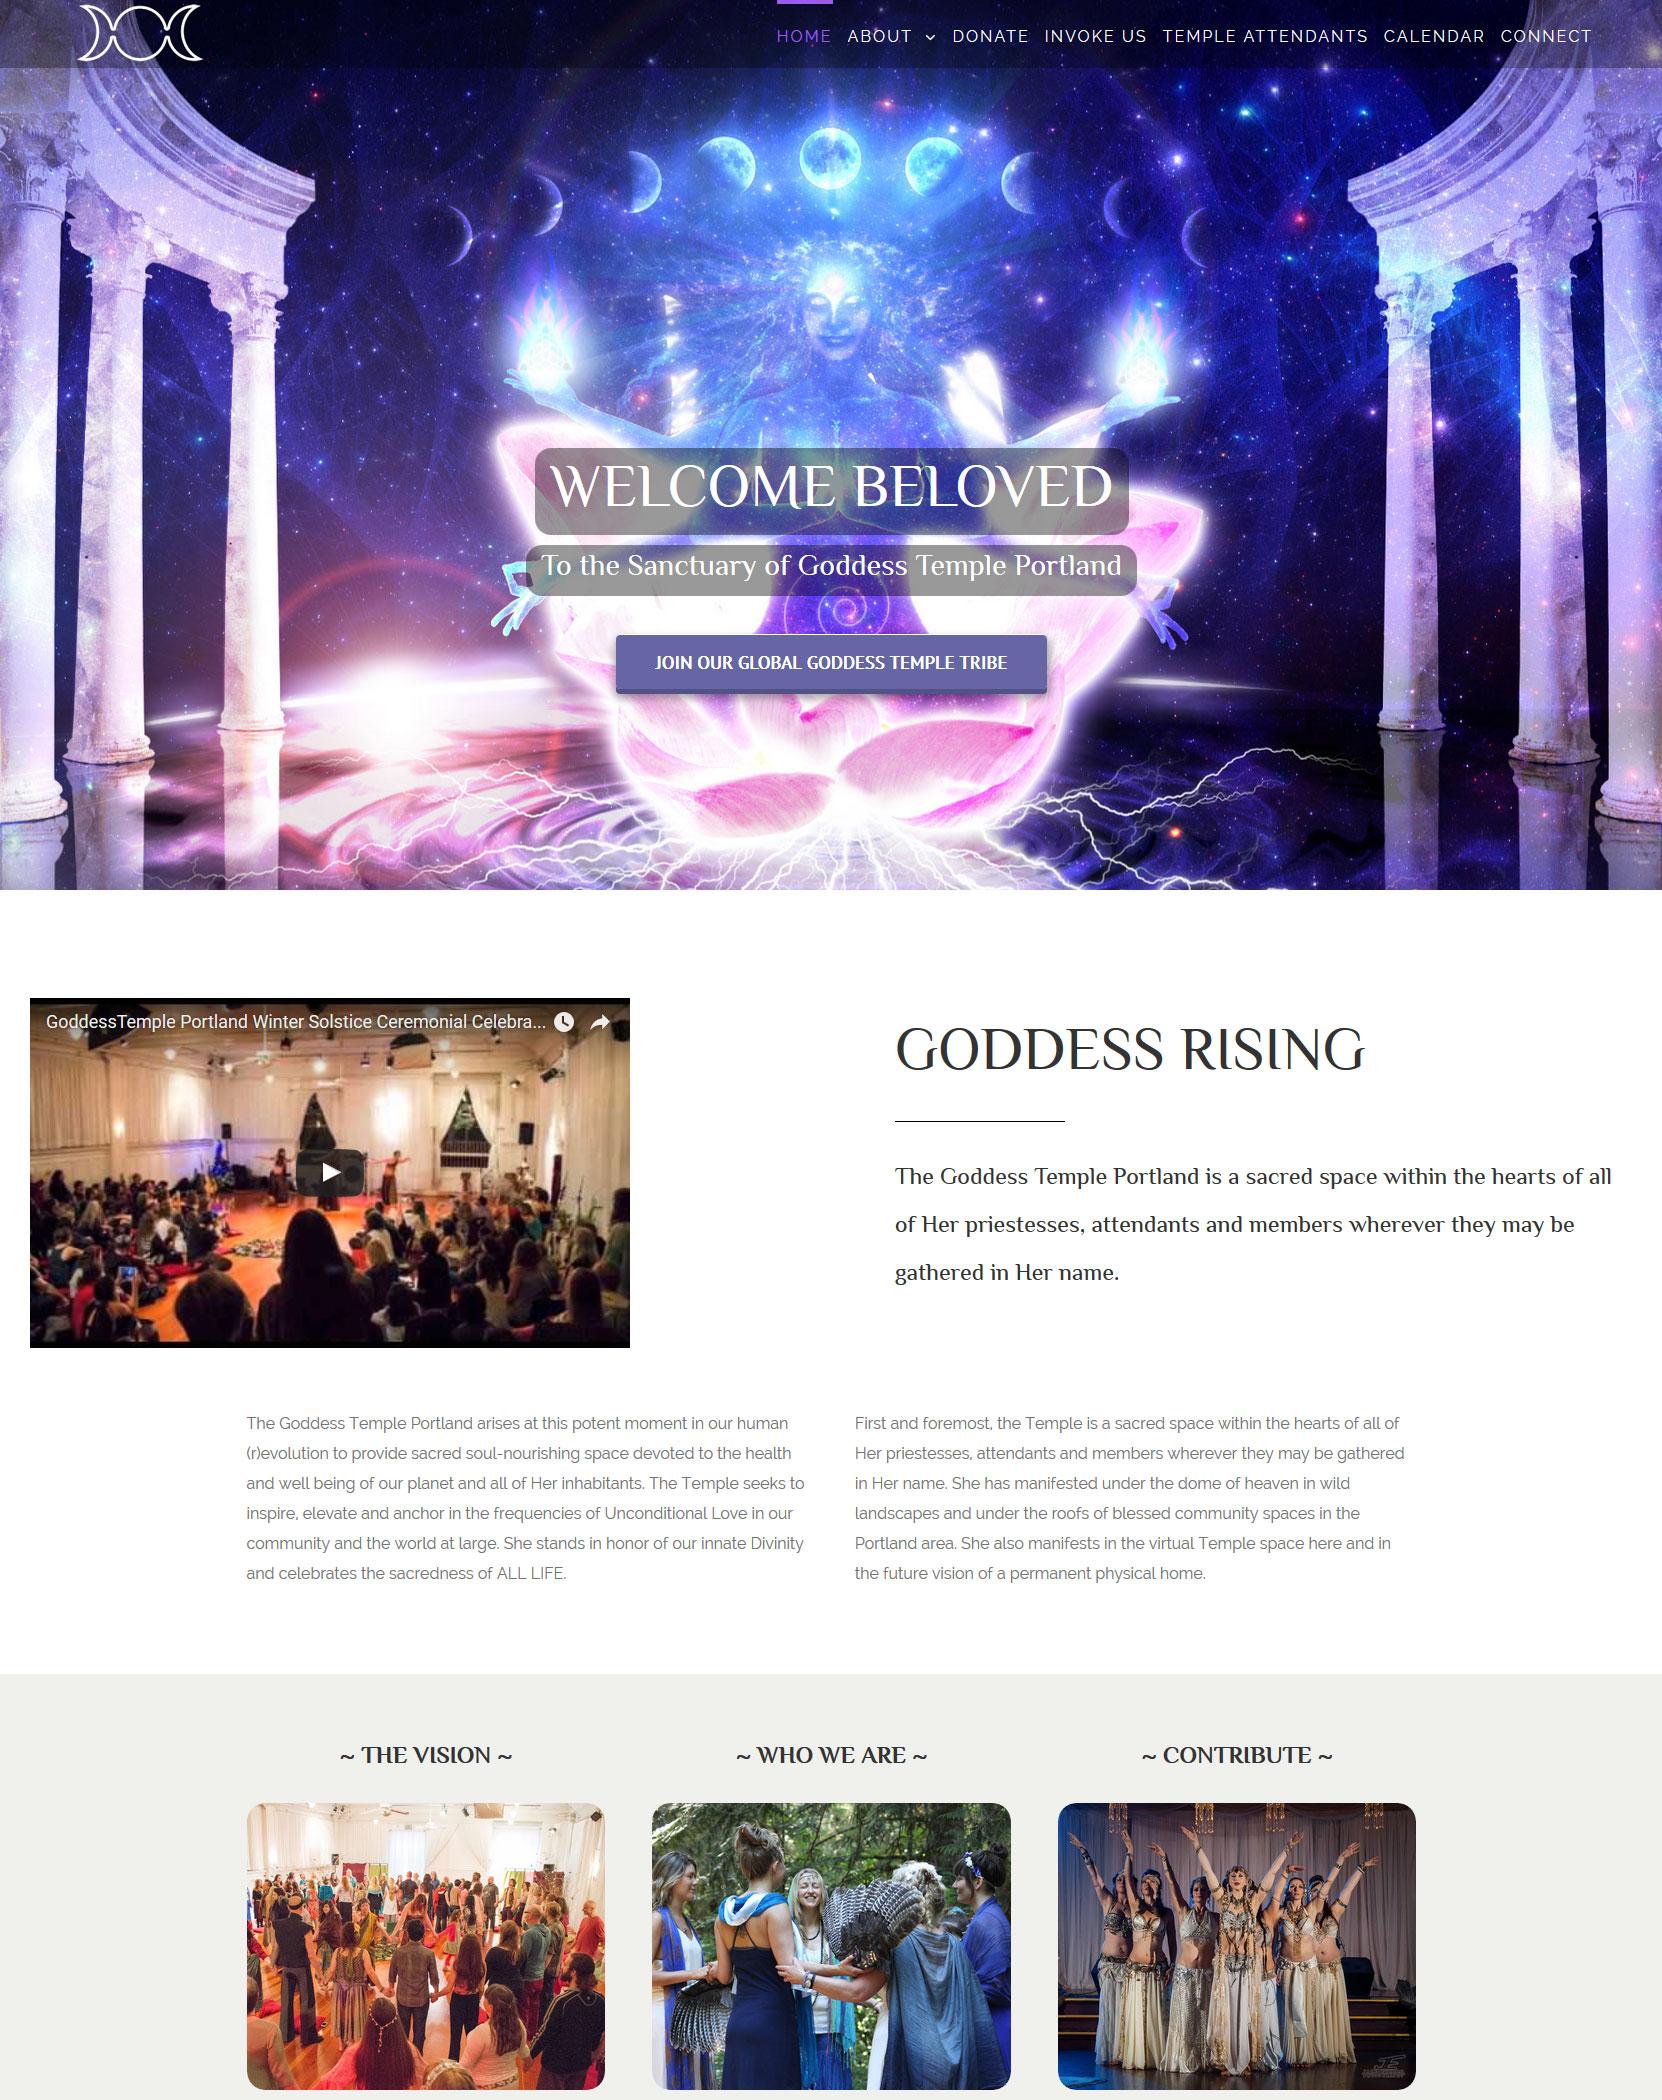 GoddessTemple-portfoloio